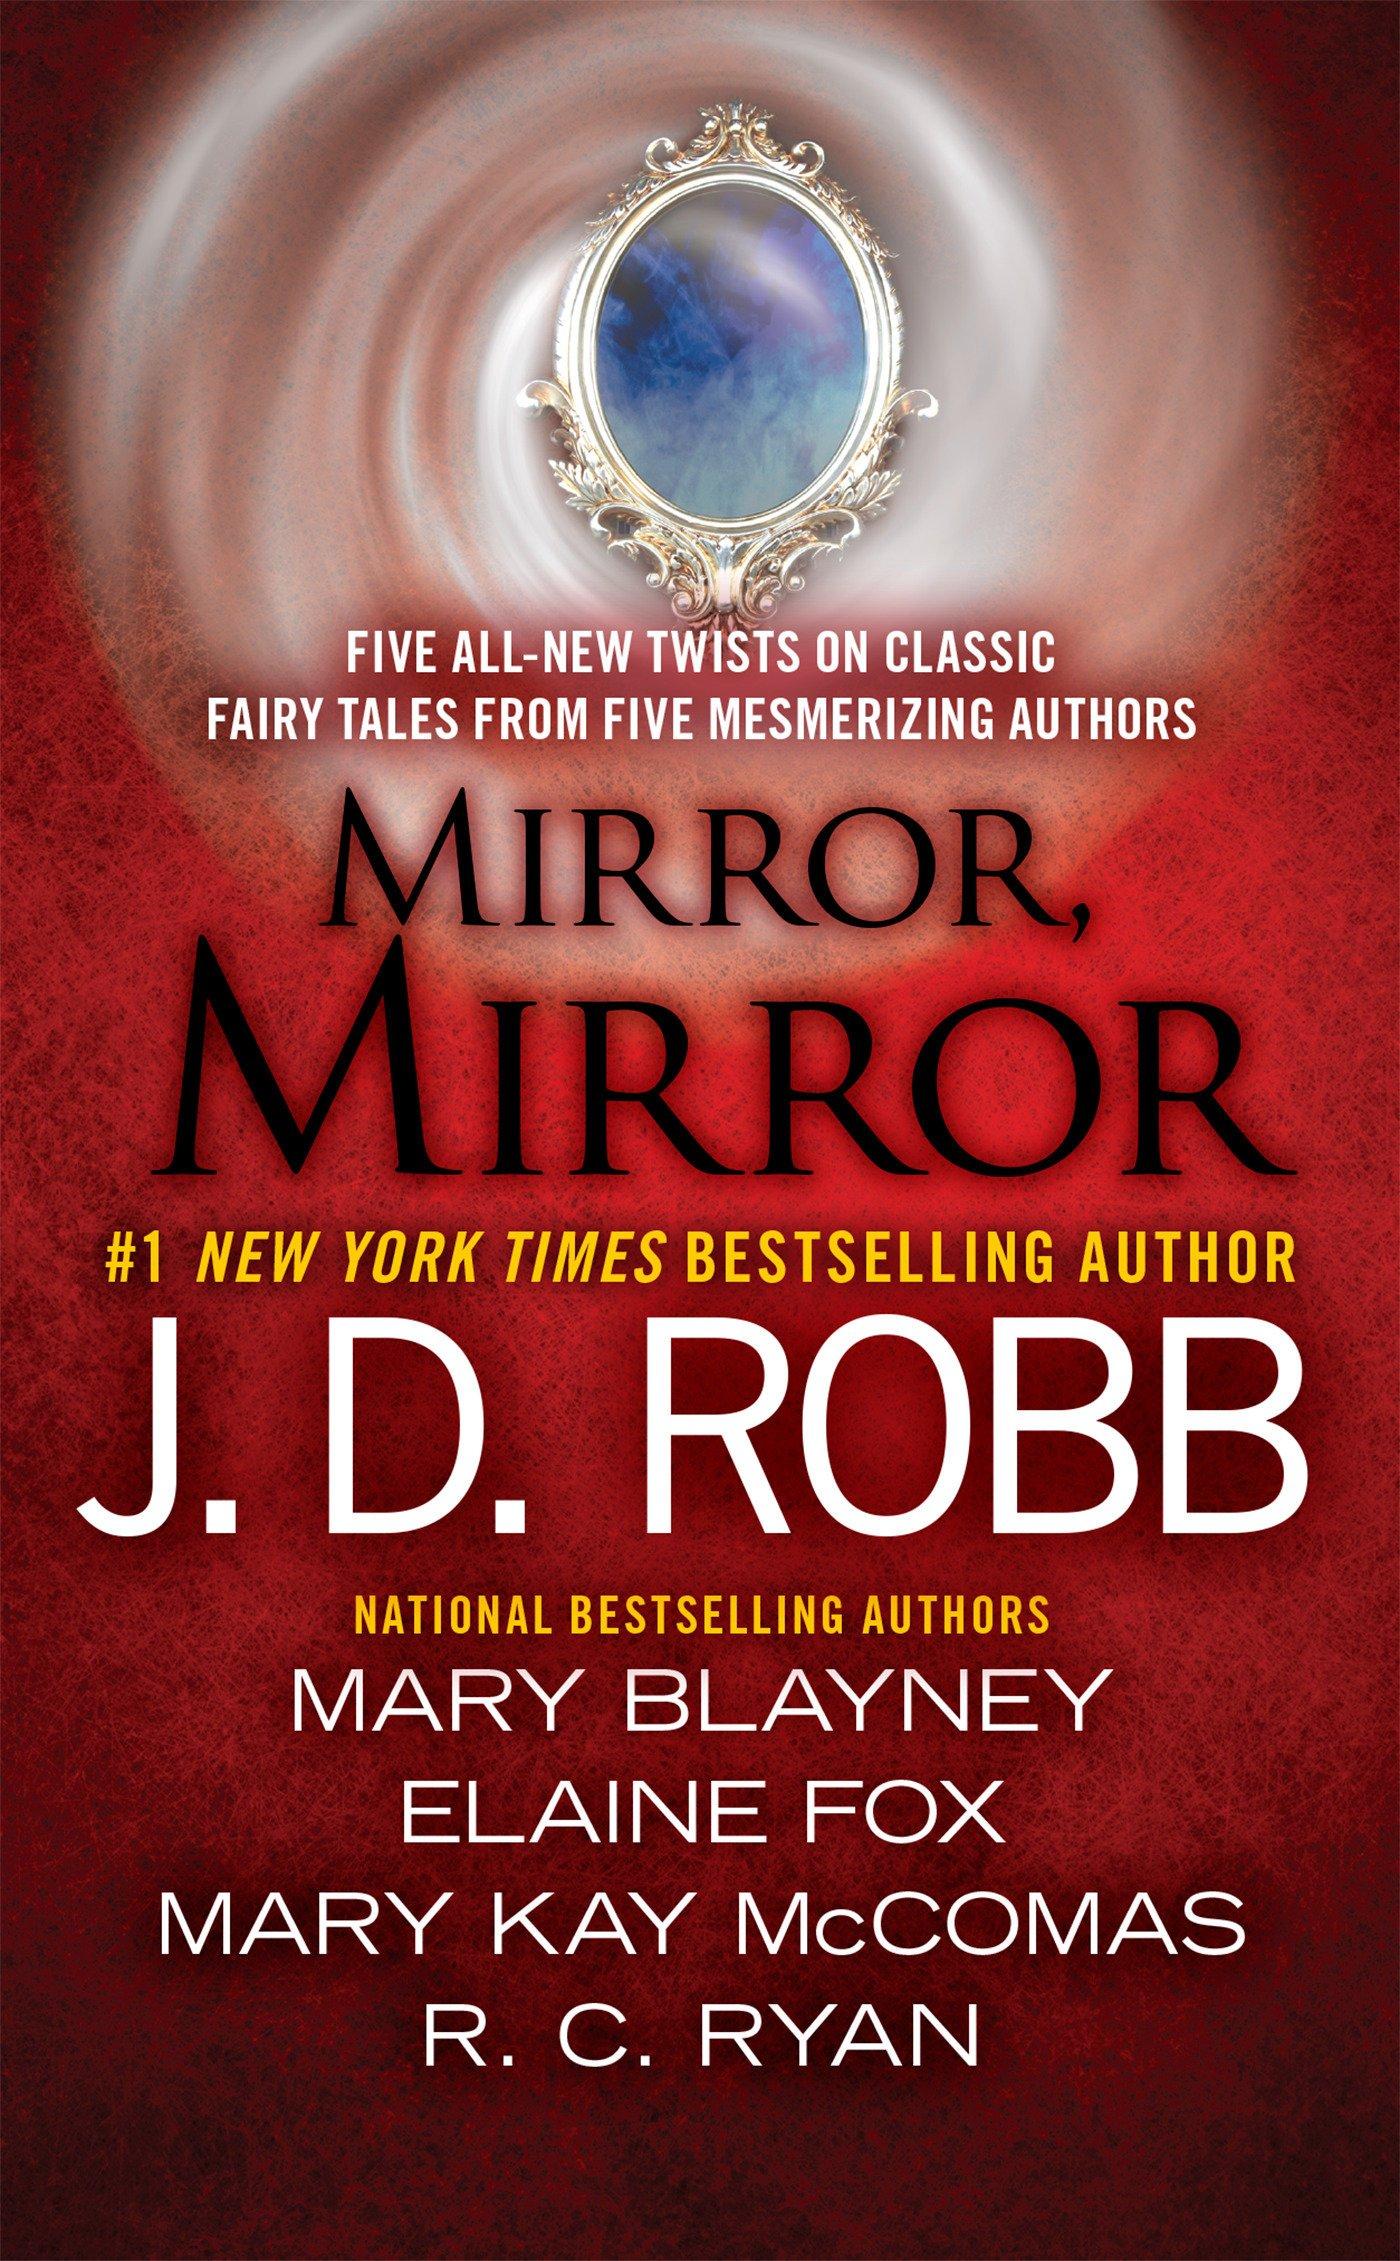 Mirror, Mirror: J  D  Robb, Mary Blayney, Elaine Fox, Mary Kay